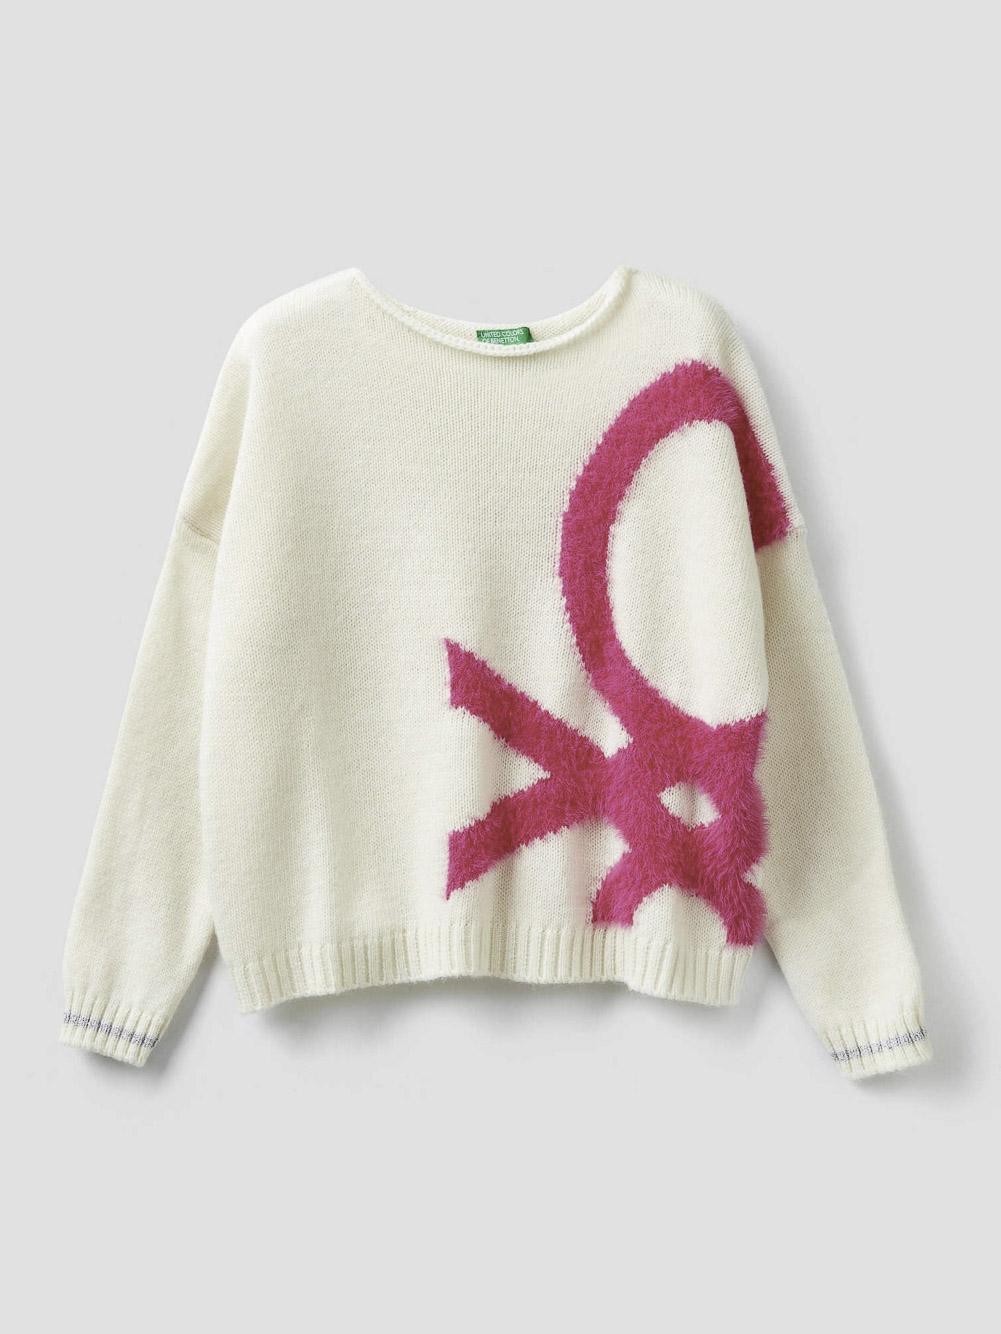 012 BENETTON Μπλούζα με μάξι λογότυπο 1176Q1928 20A910